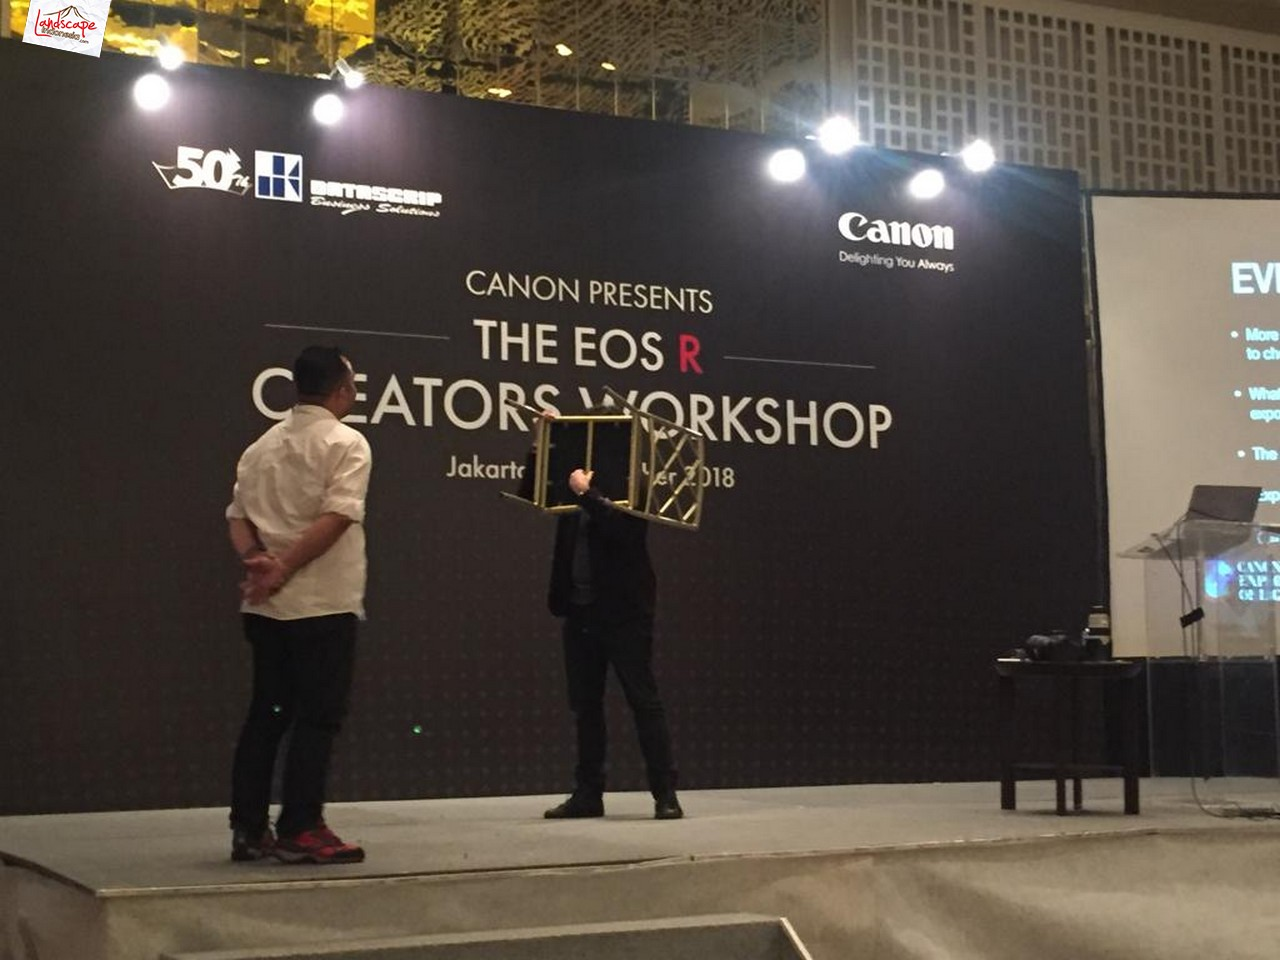 eos r creators workshop 1 - EOS R Creators Workshop